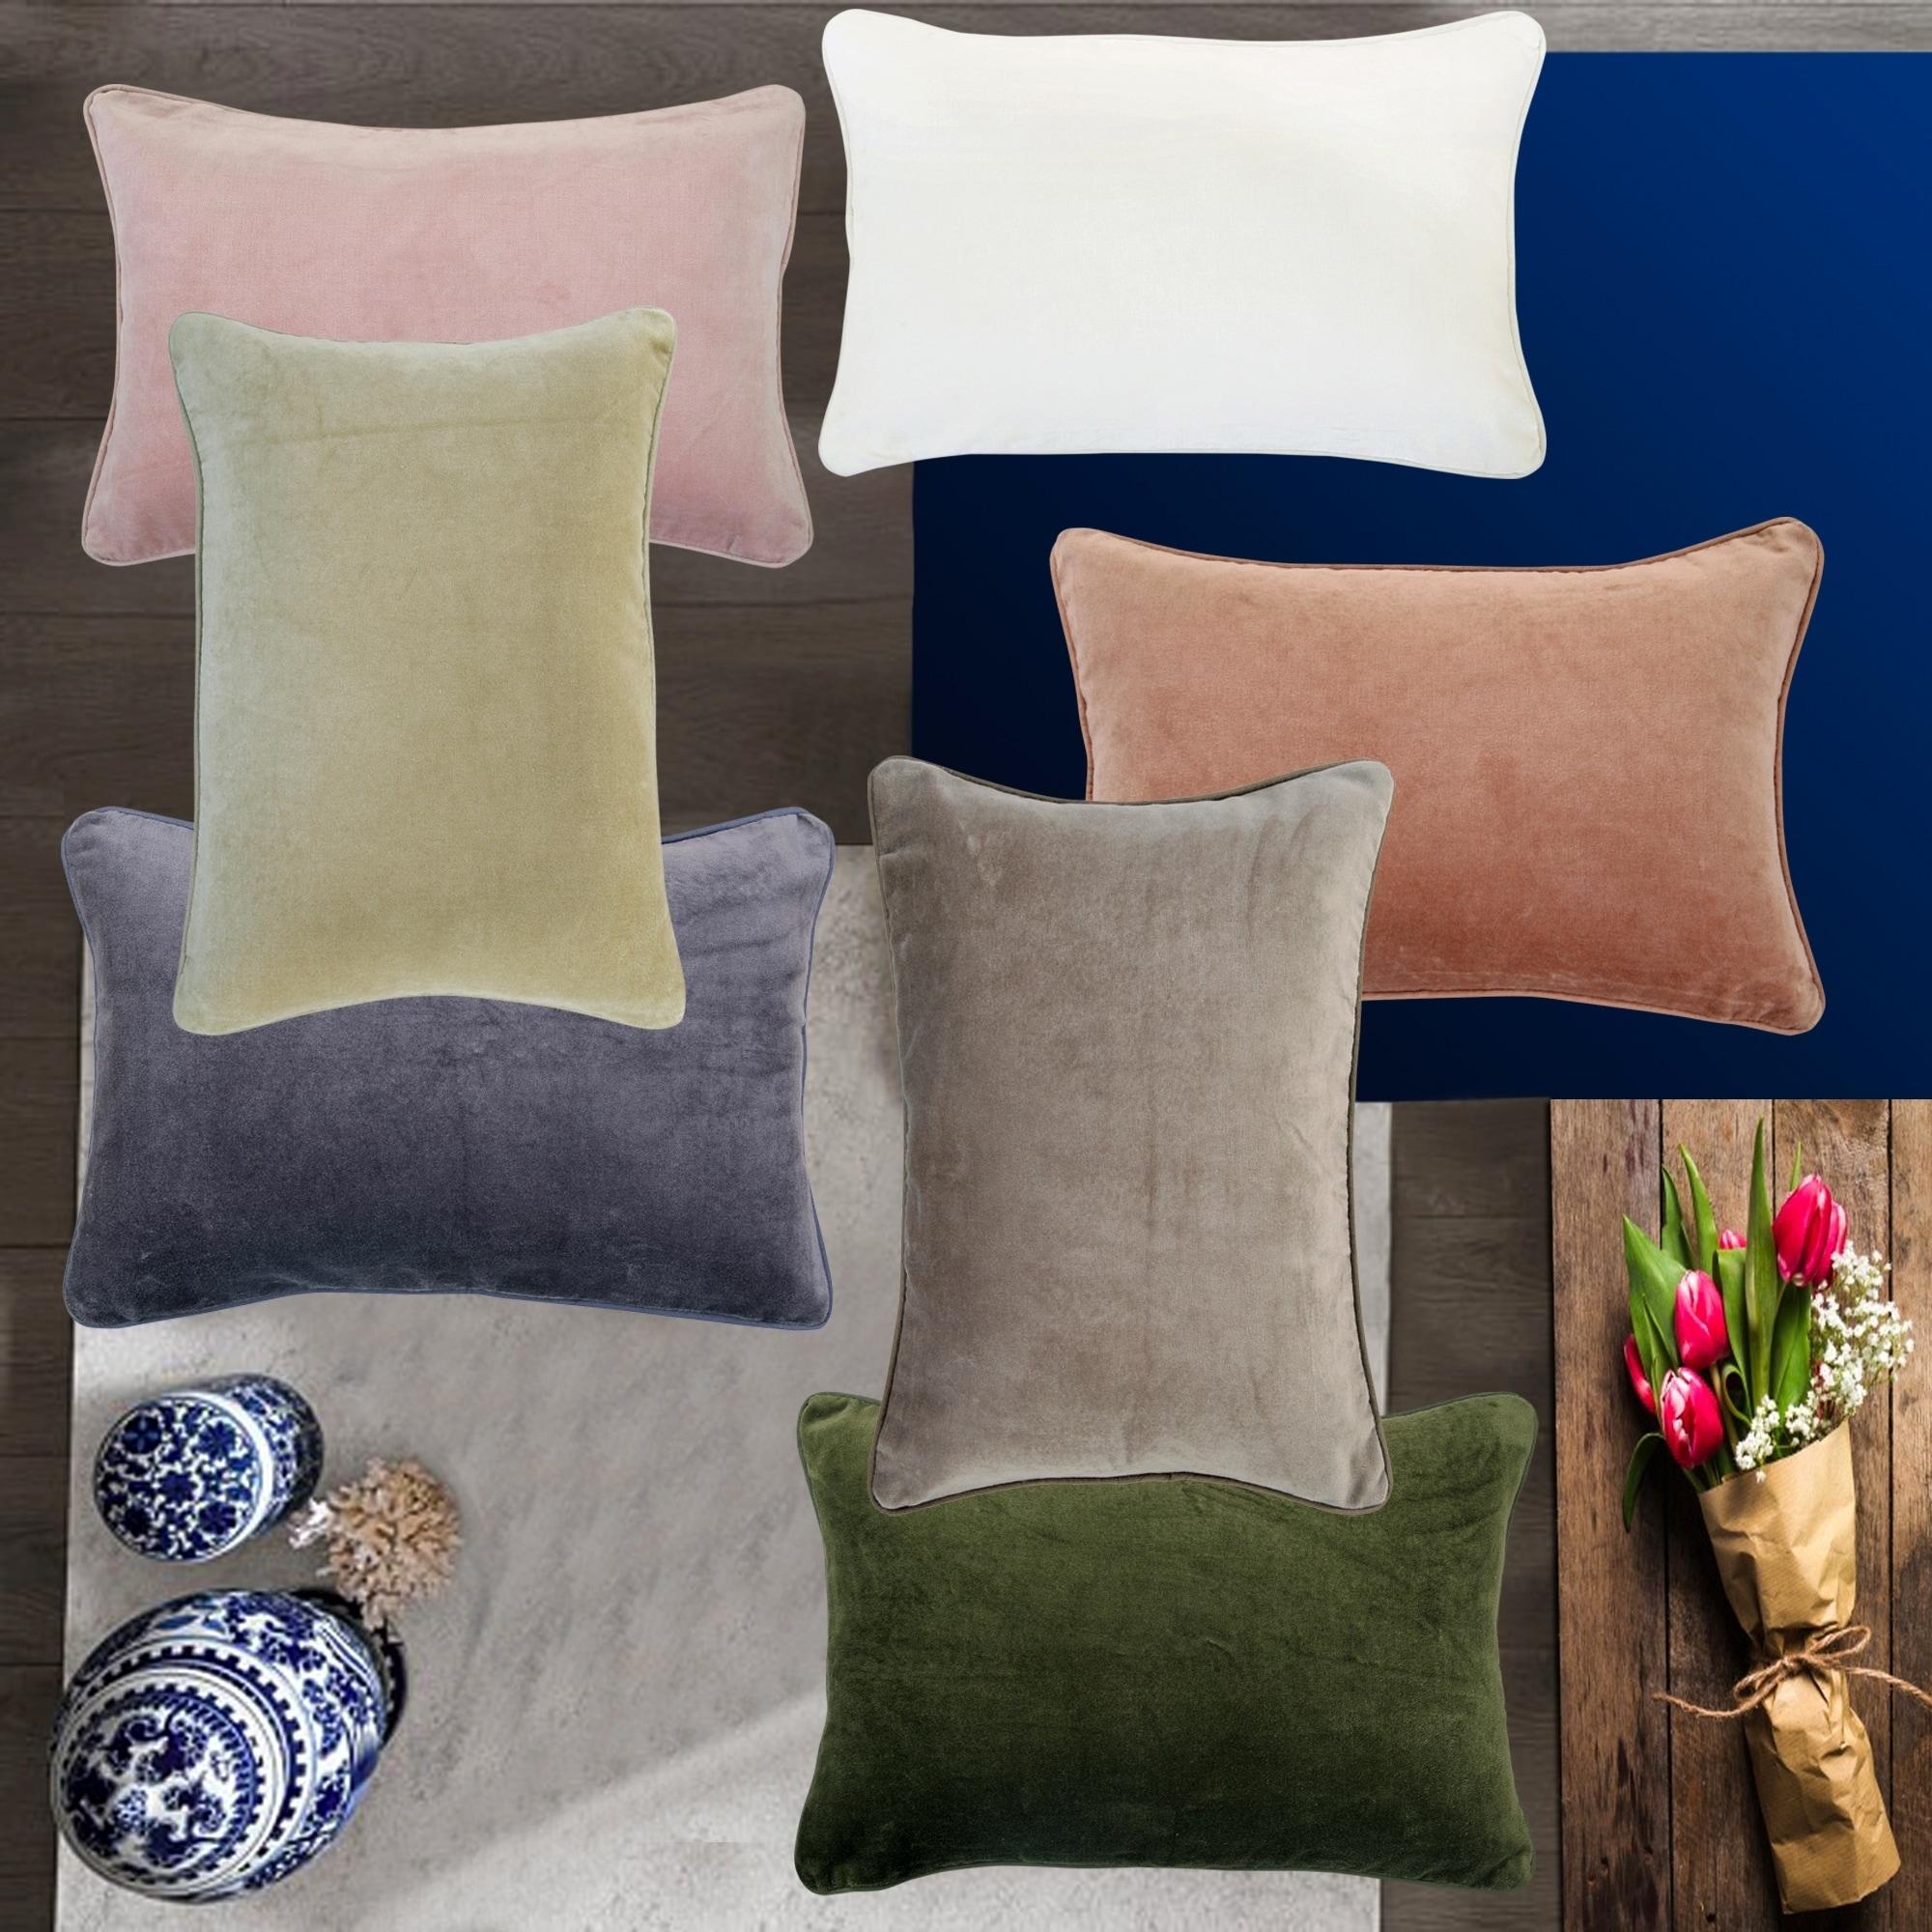 Krus Cotton Velvet 12x18 Lumbar Decorative Throw Pillow Cover Set Of 2